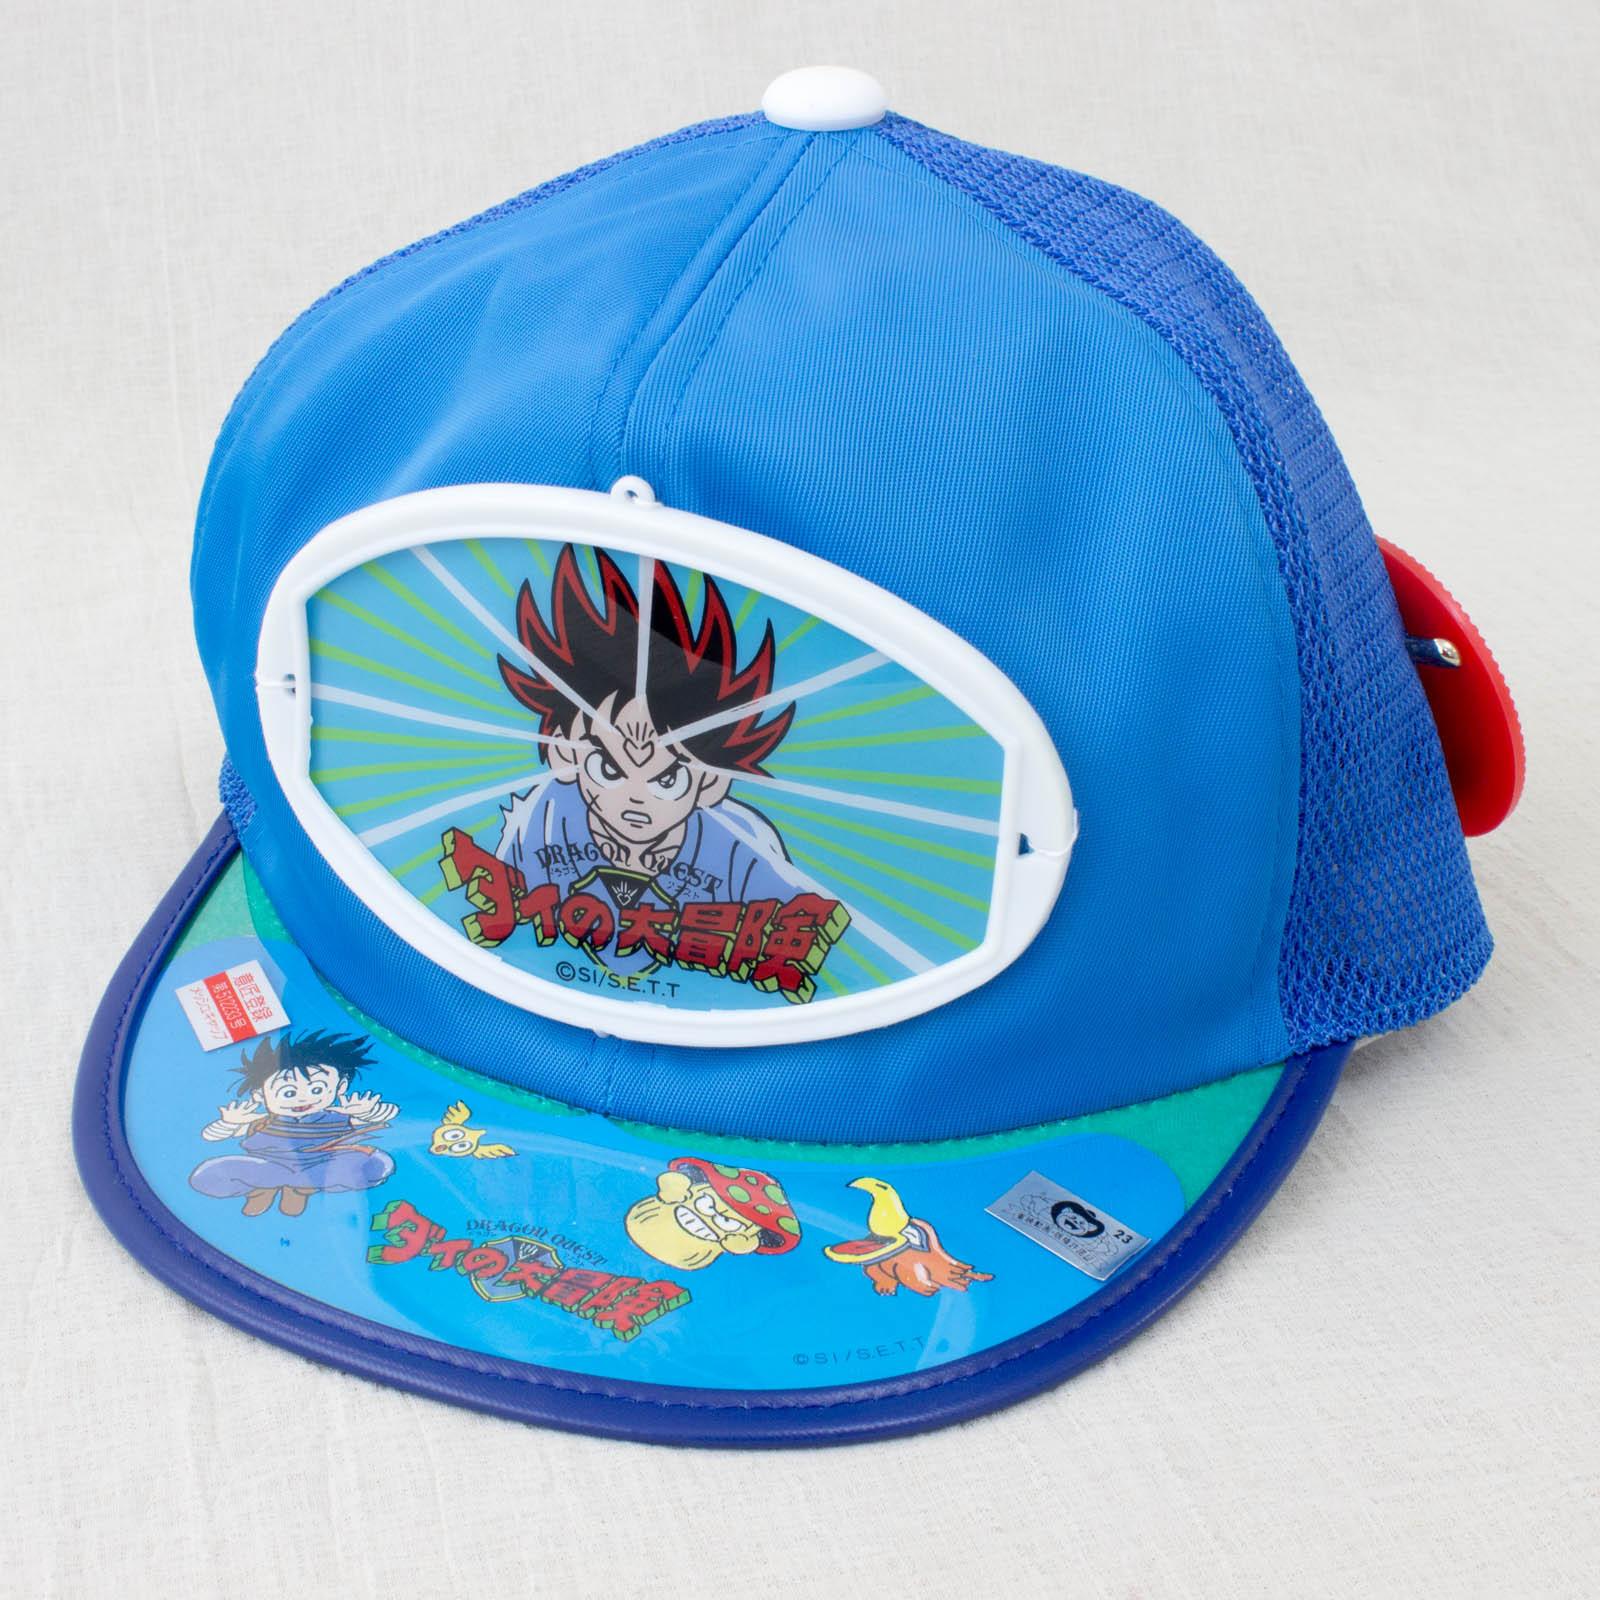 Dragon Quest: The Adventure of Dai Kids Size Baseball Cap JAPAN ANIME